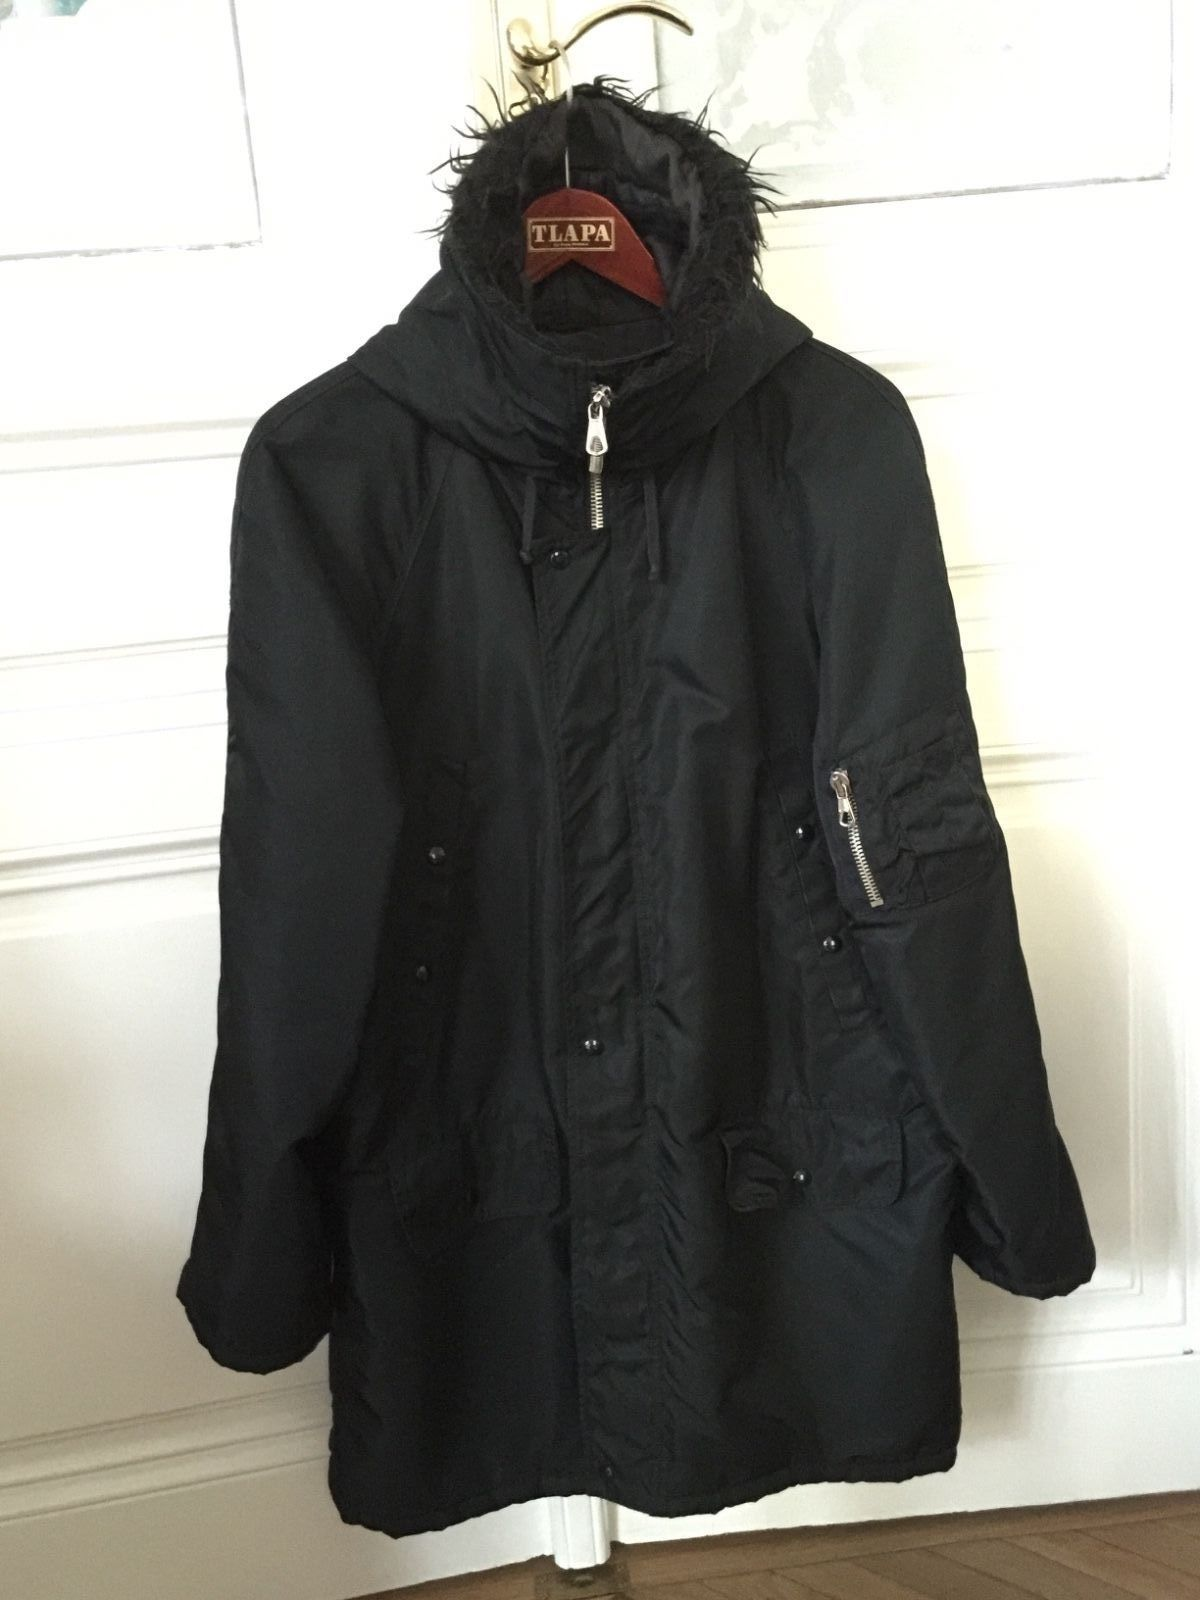 Helmut Lang Archive N 3B Mainline Jacket | eBay